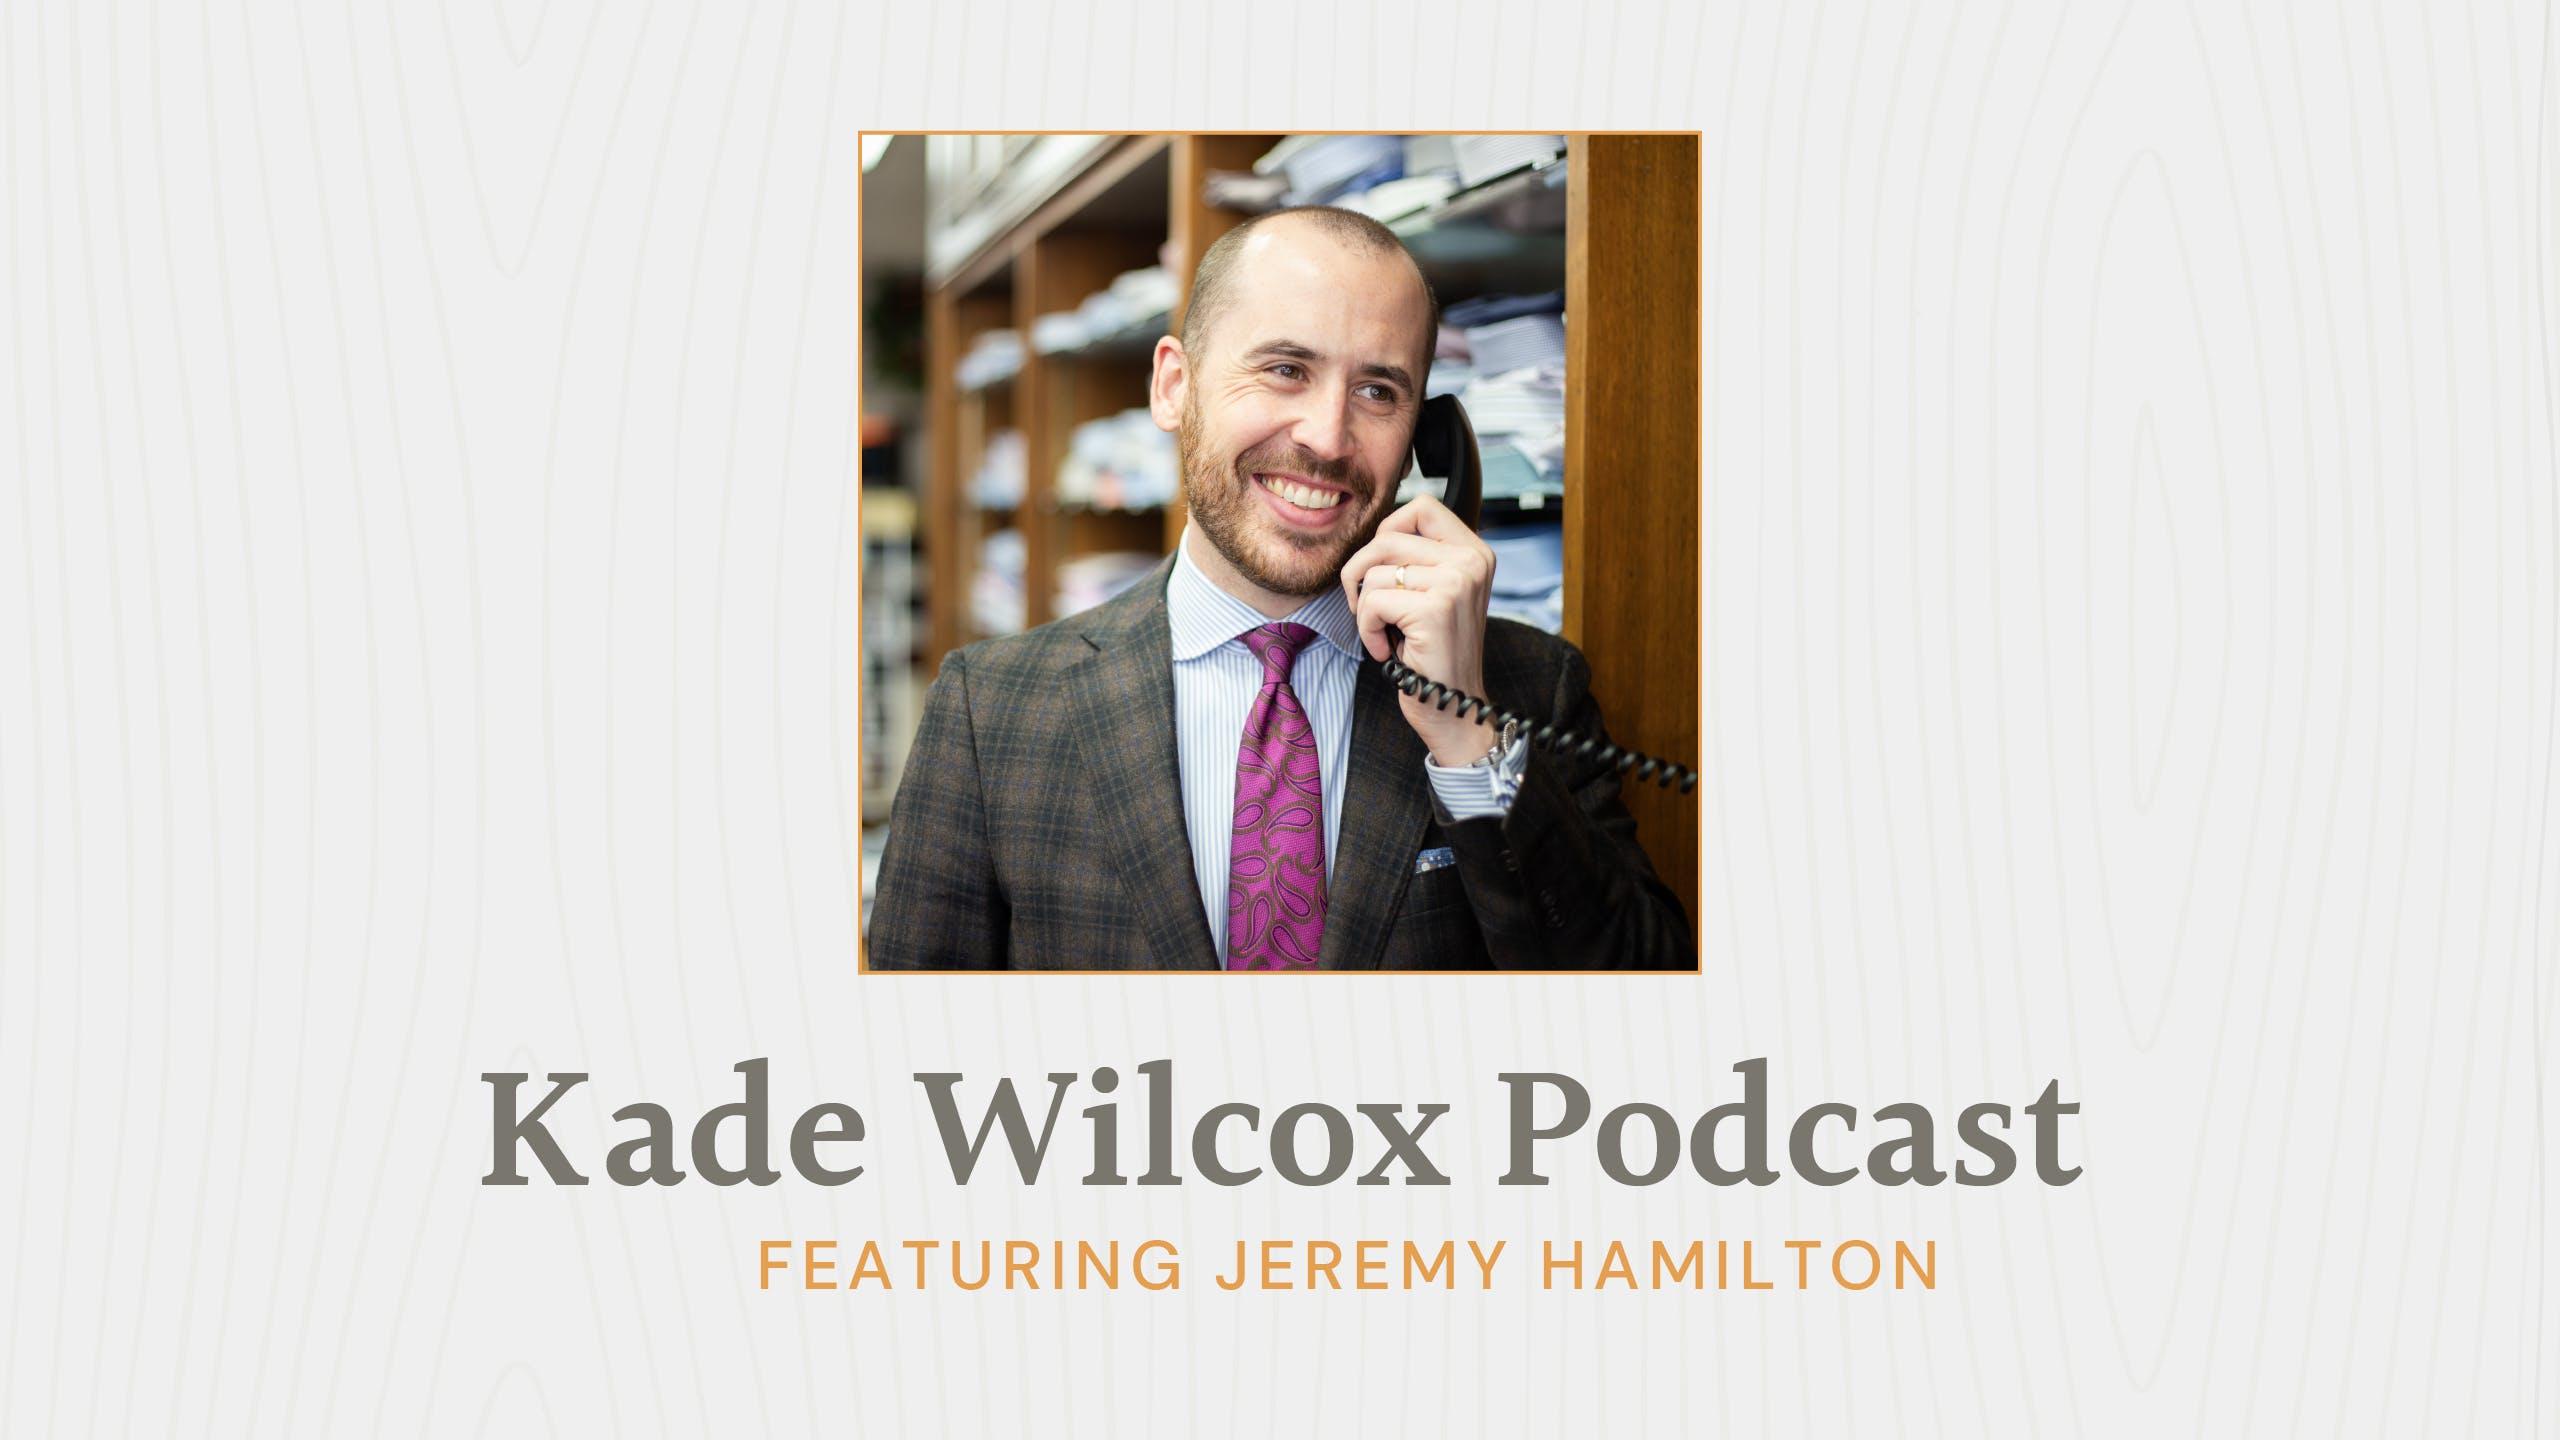 The Kade Wilcox Podcast: Jeremy Hamilton image